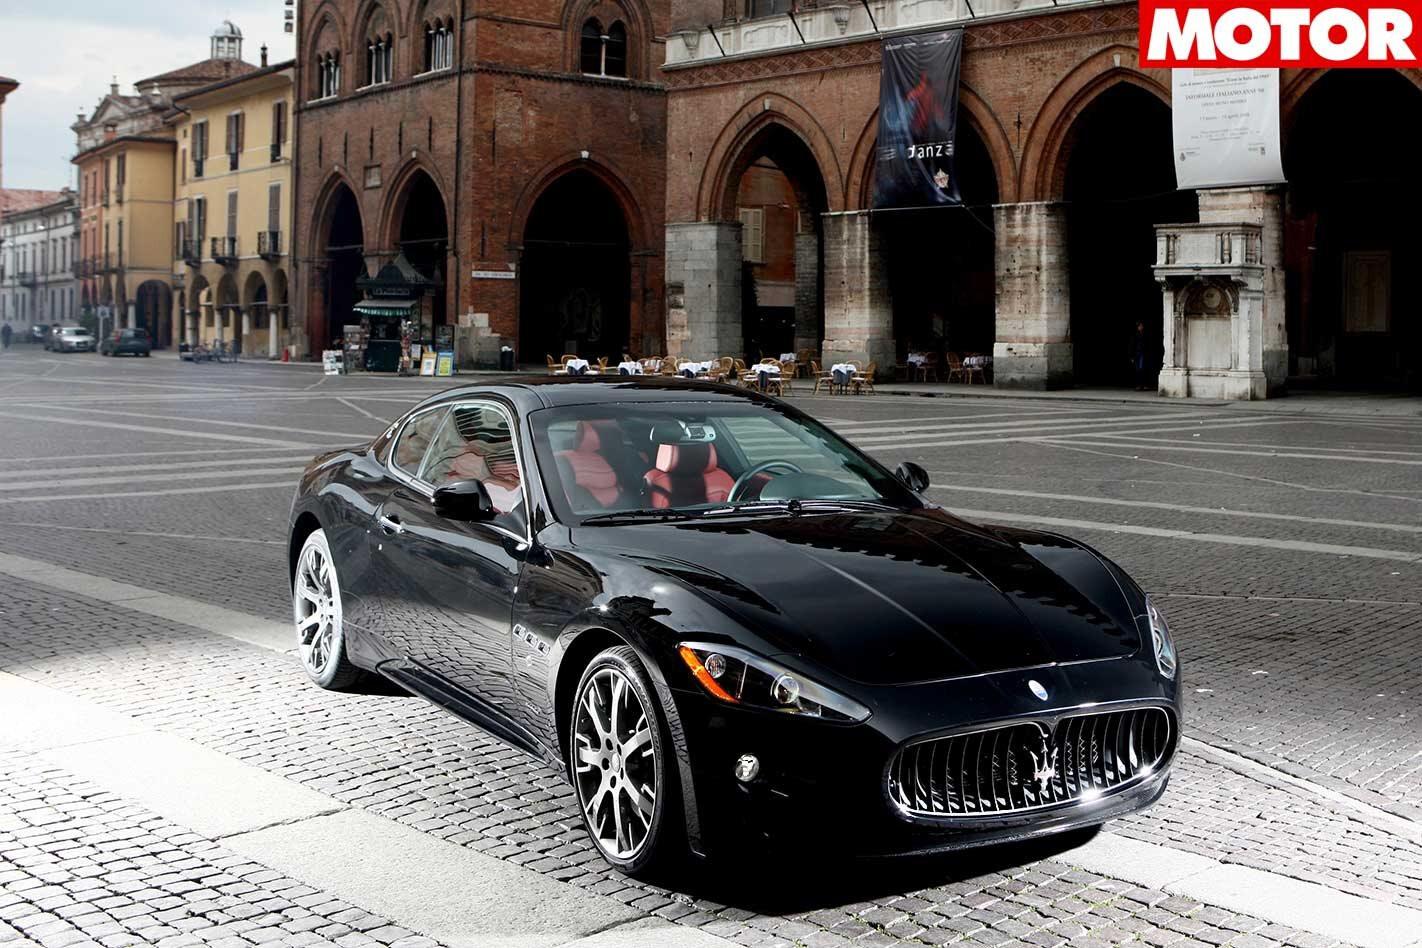 2008 Maserati Granturismo S review classic MOTOR